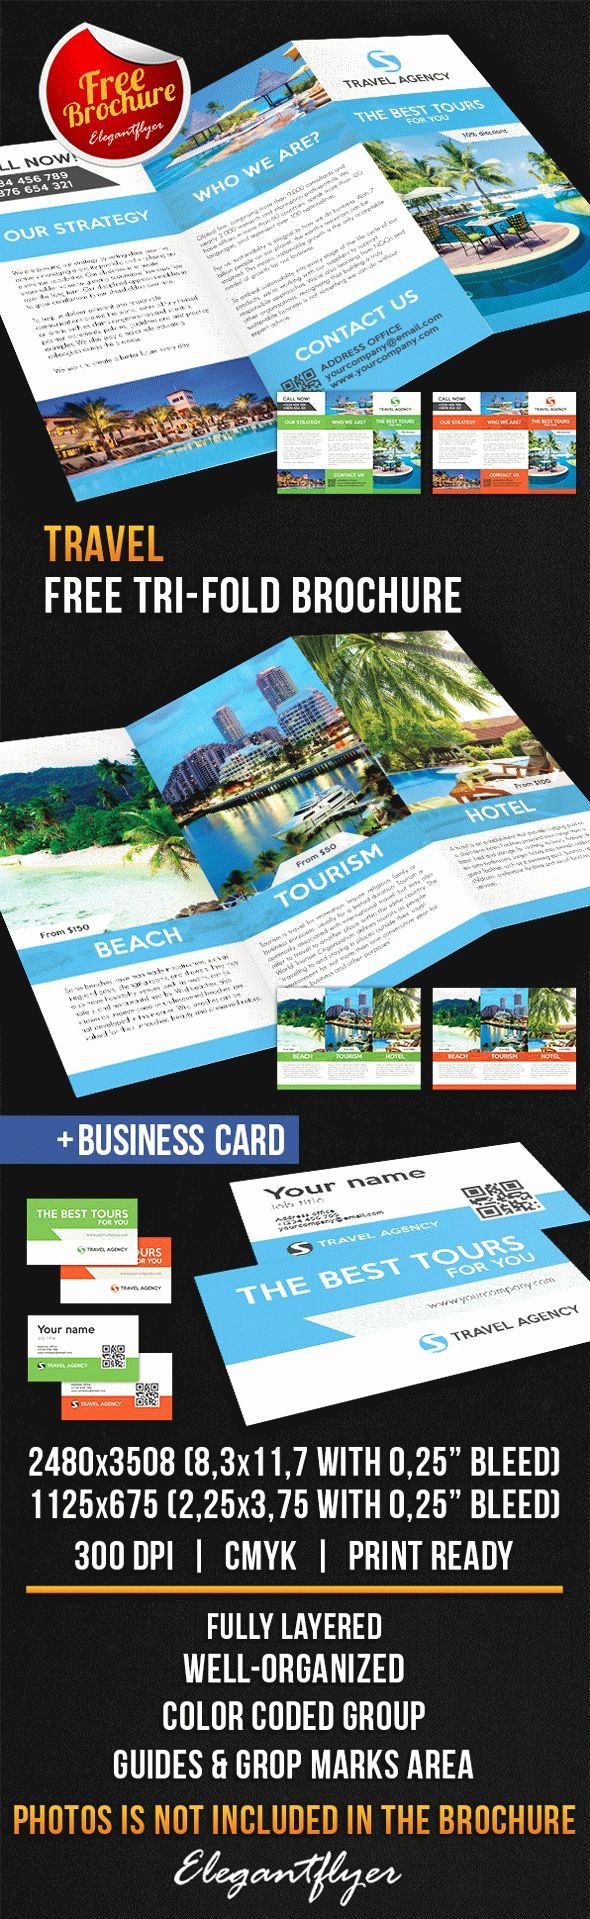 Tri Fold Brochure Template Psd Lovely Travel Tri Fold Brochure – Free Psd Template – by Elegantflyer